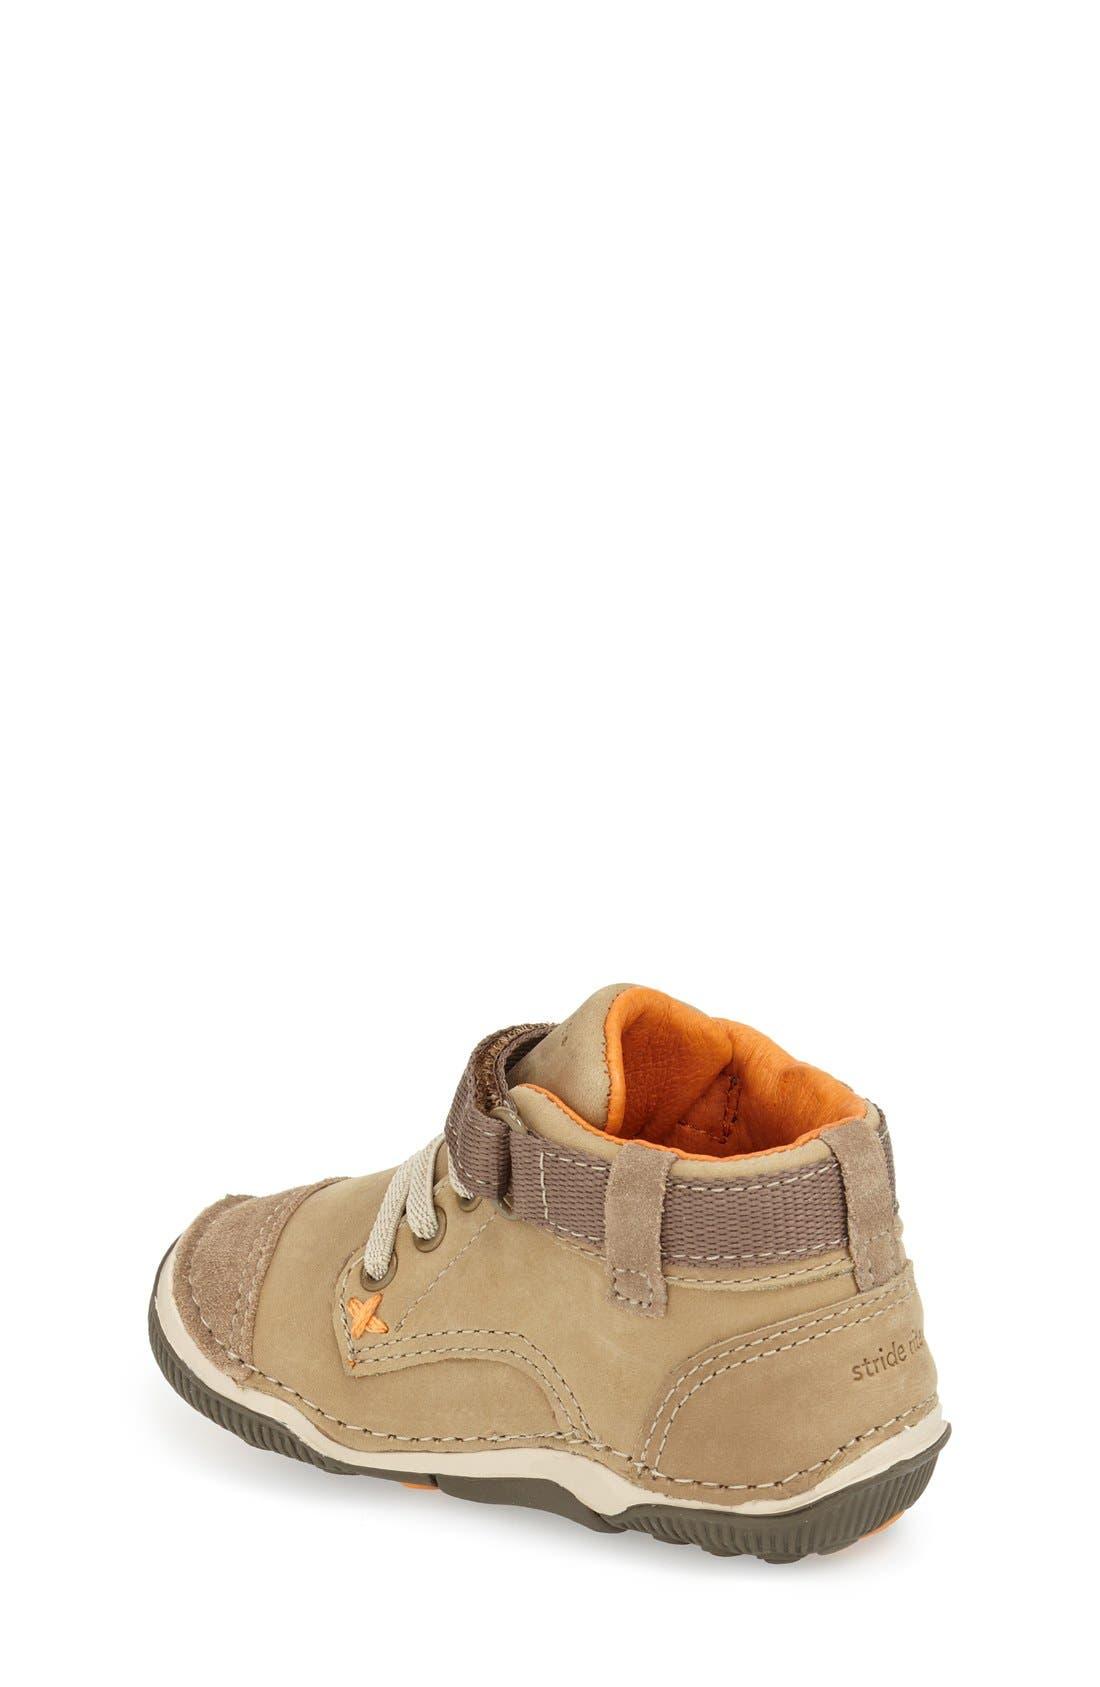 STRIDE RITE, 'Garrett' High Top Bootie Sneaker, Alternate thumbnail 2, color, BROWN